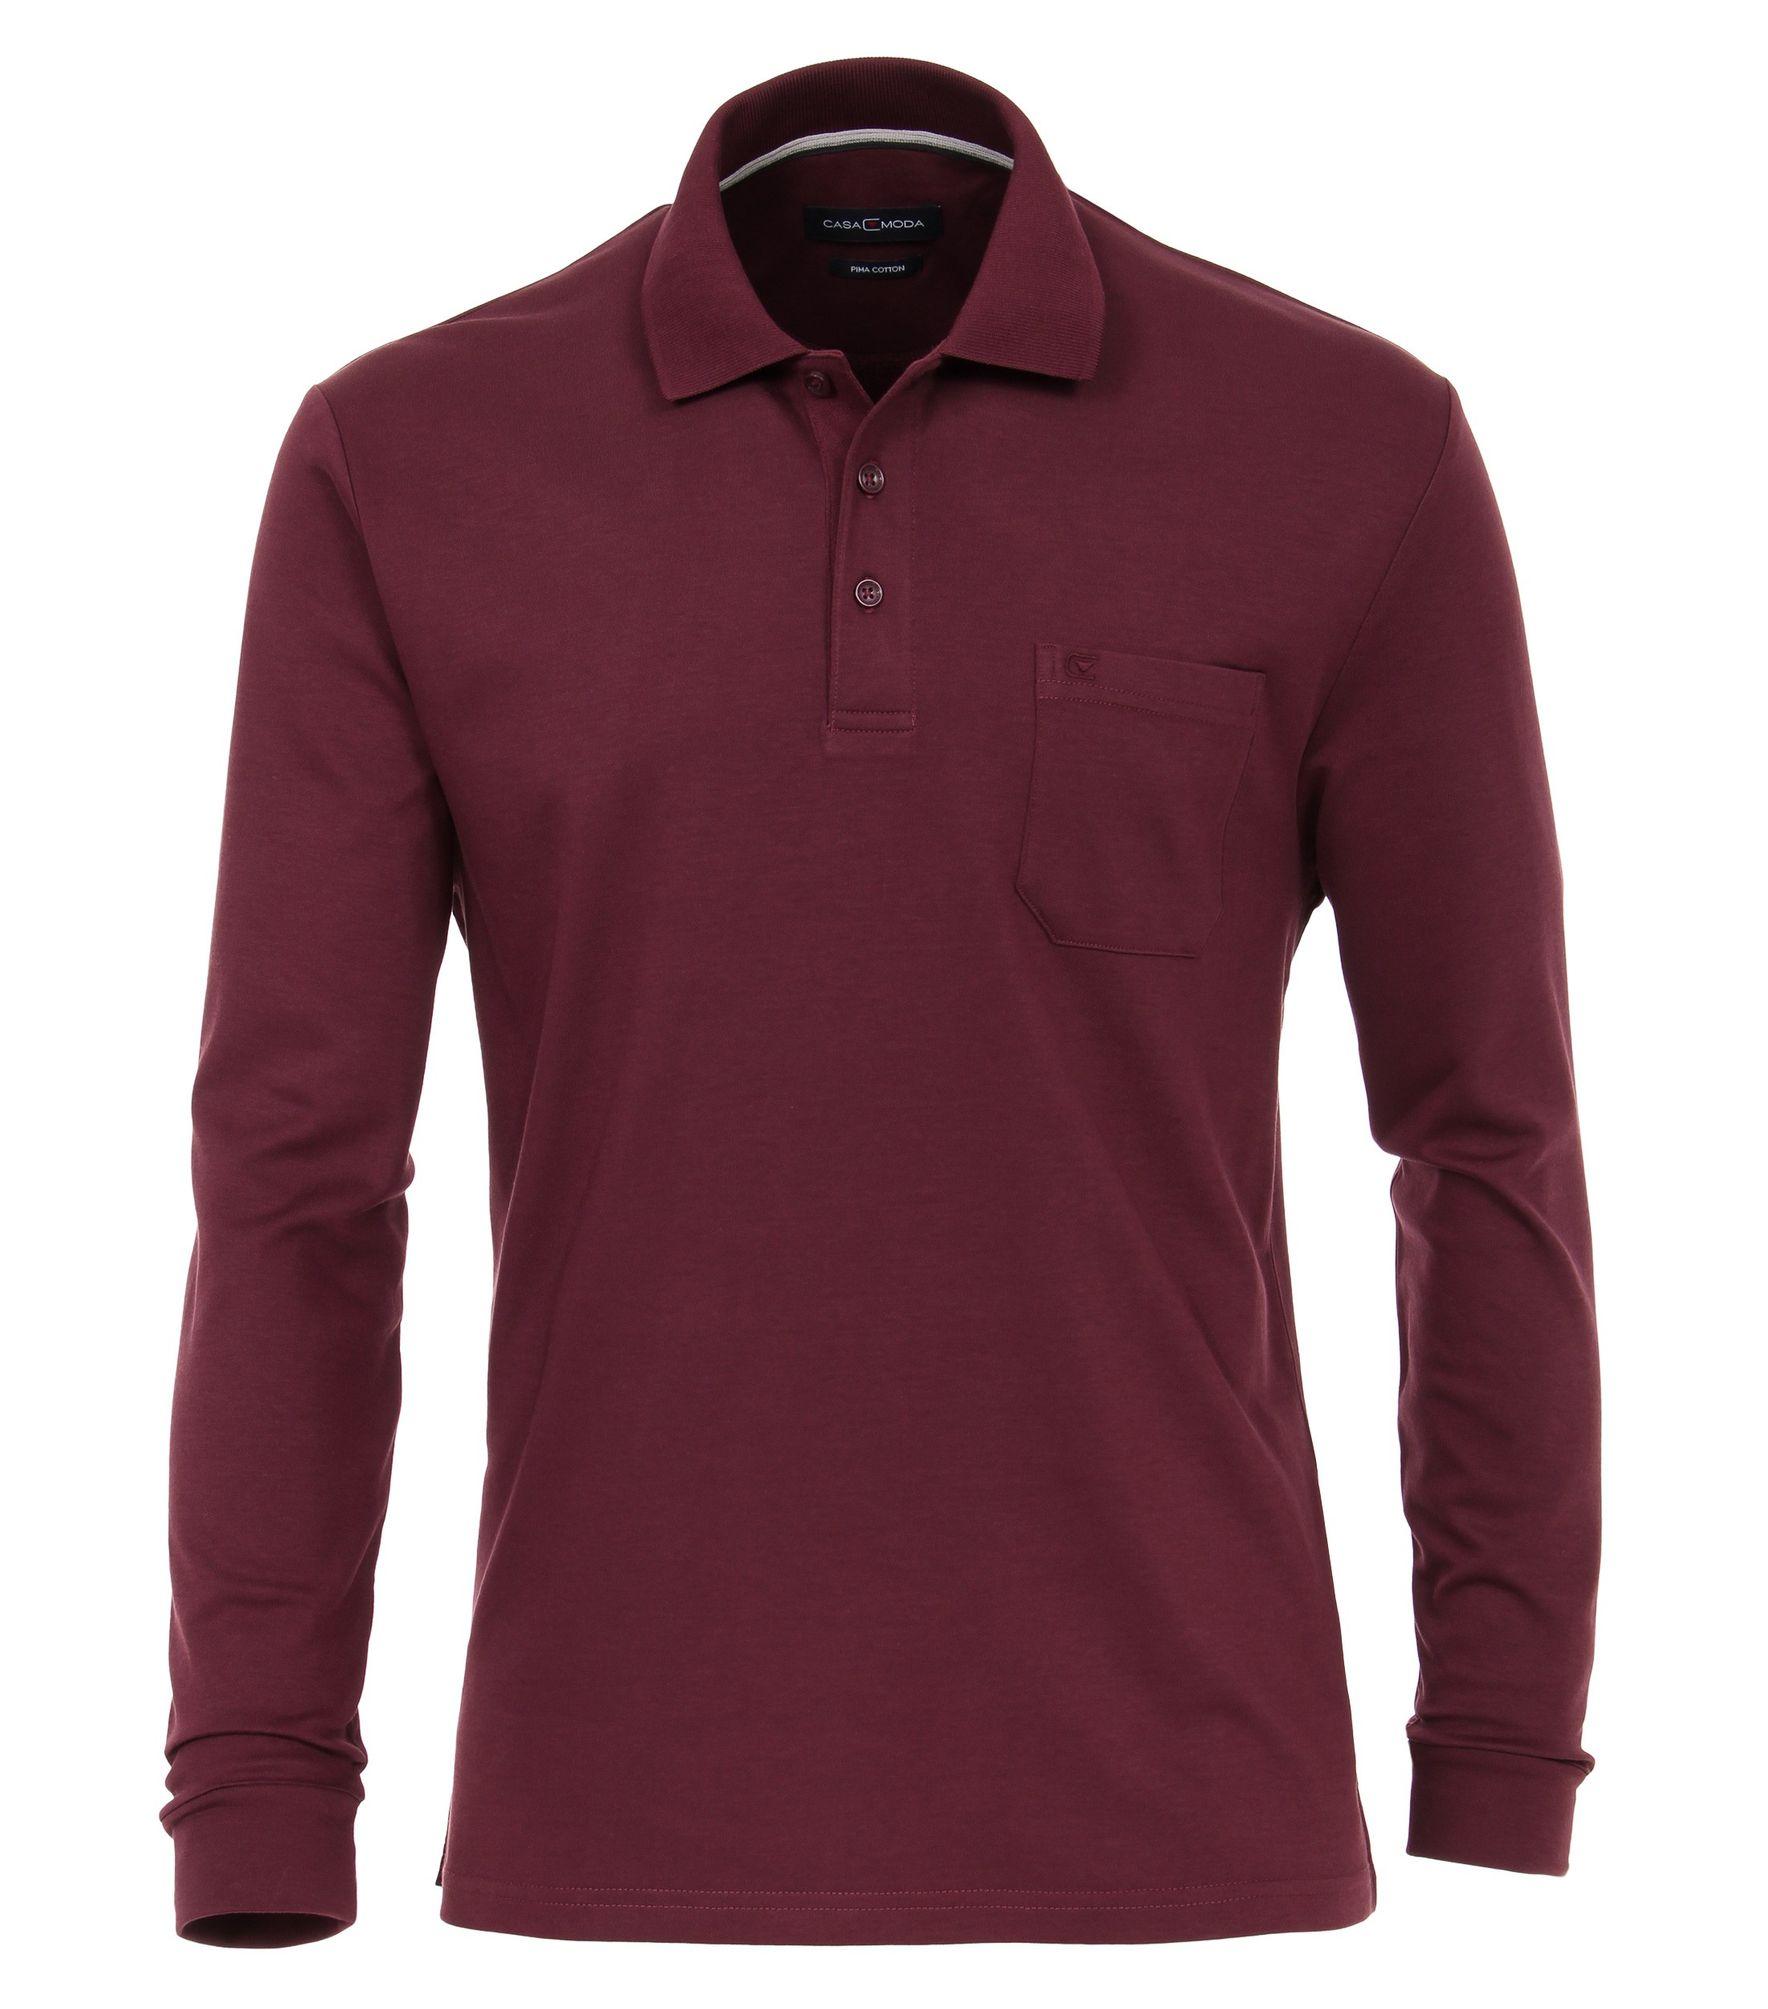 776a13982e29 Casa Moda - Herren Polo-Shirt Langarm unifarben mit Brusttasche in  verschiedenen Farben (483002600